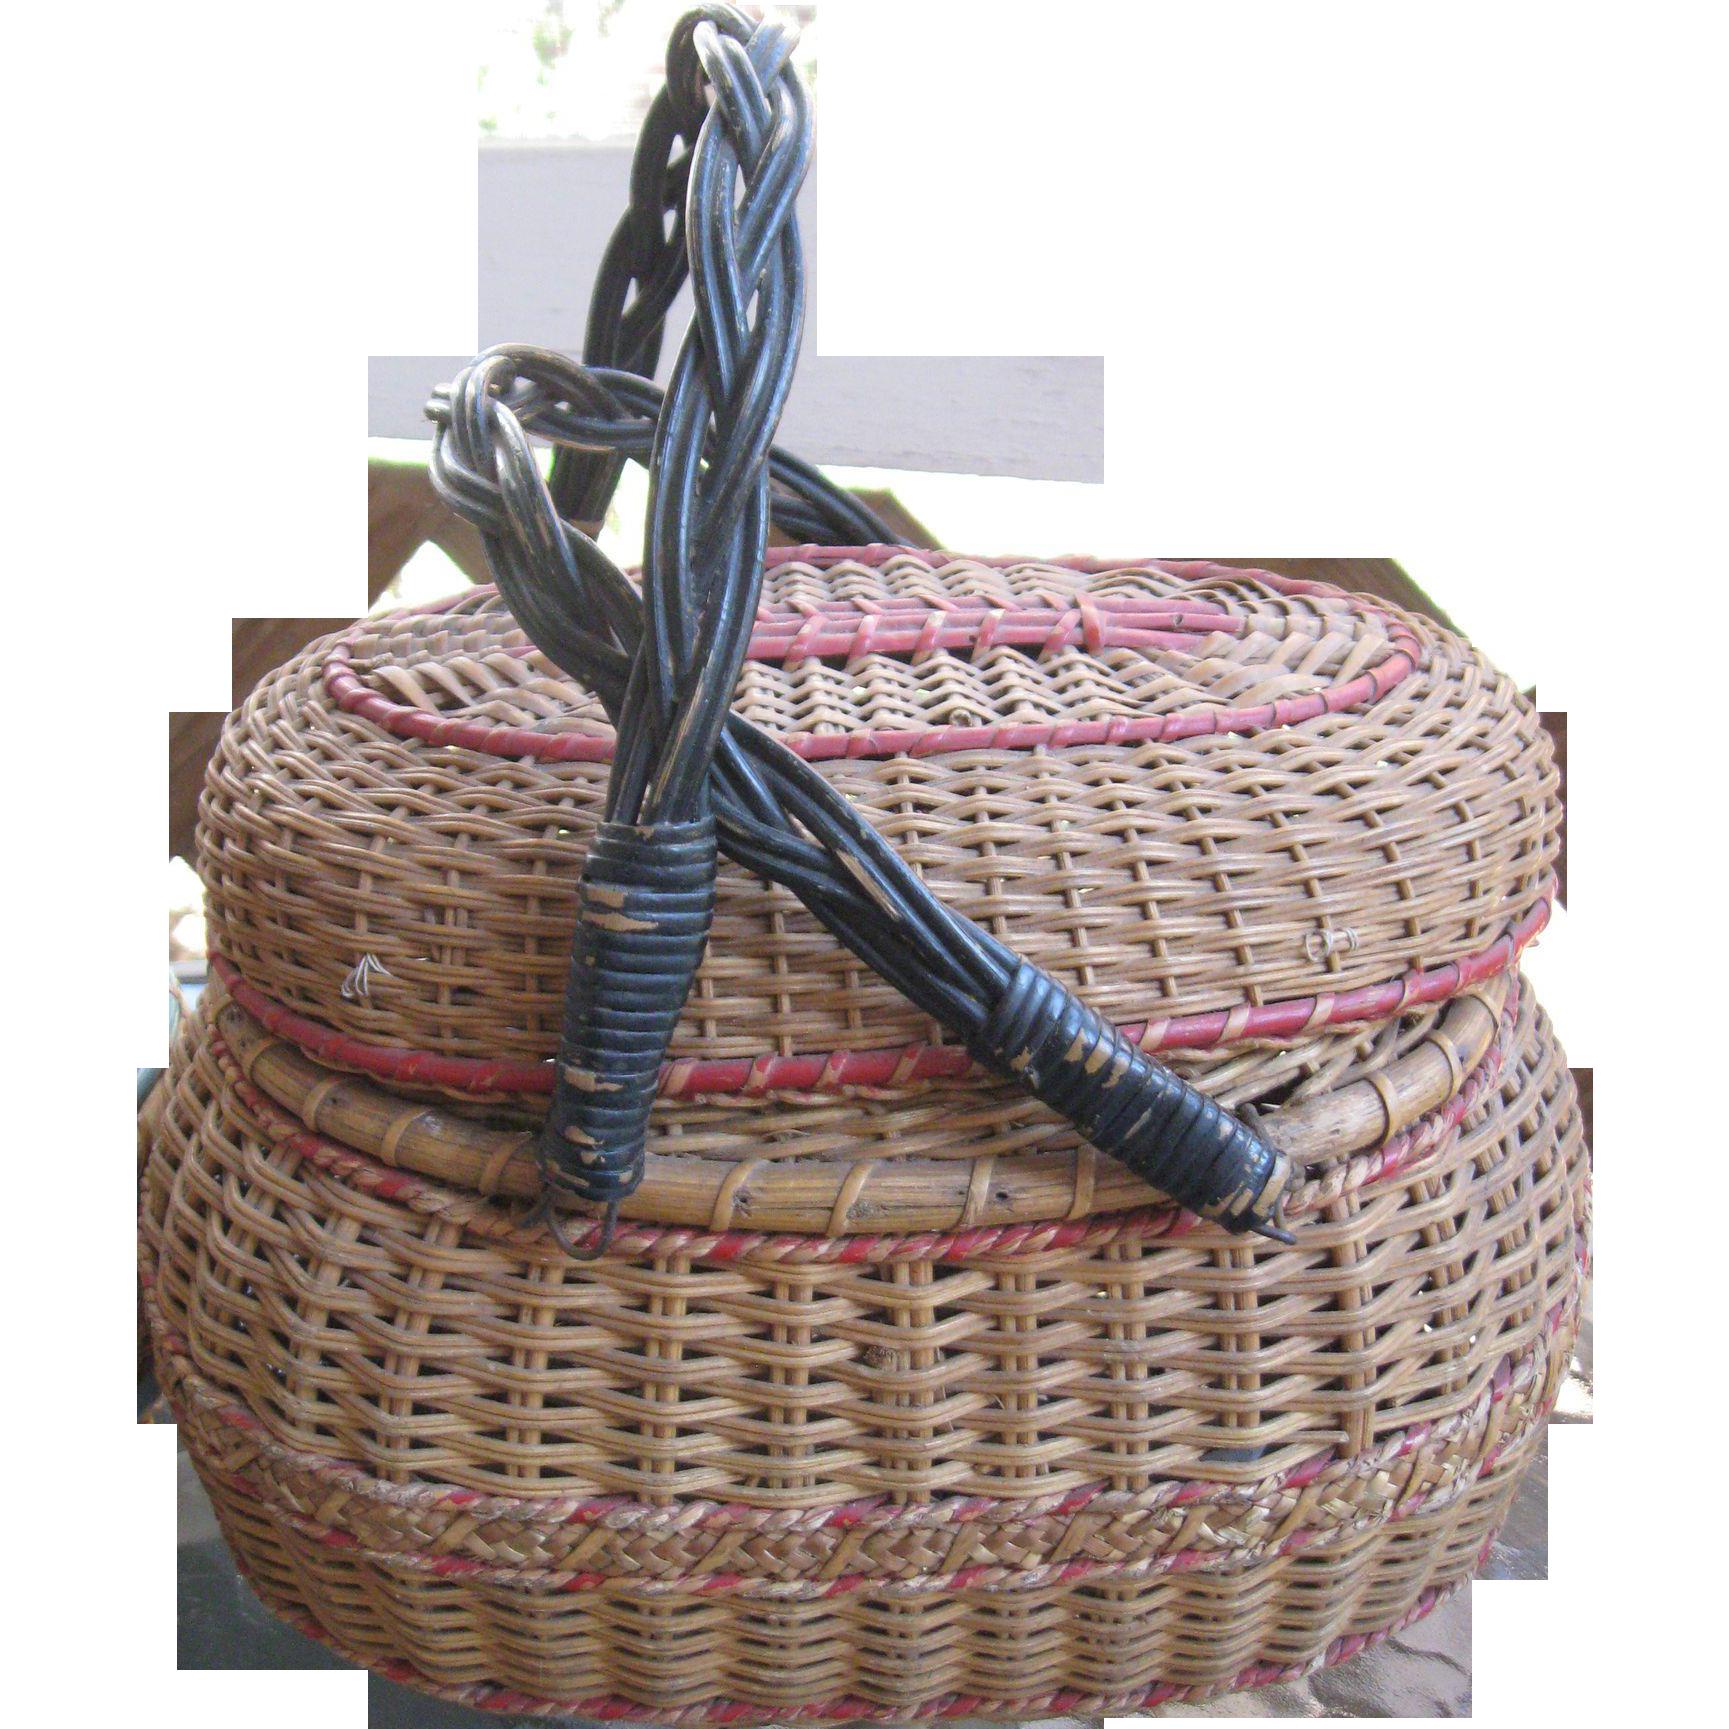 Handmade Baskets In Pa : Antique amish folk art basket kavli lancaster pa from